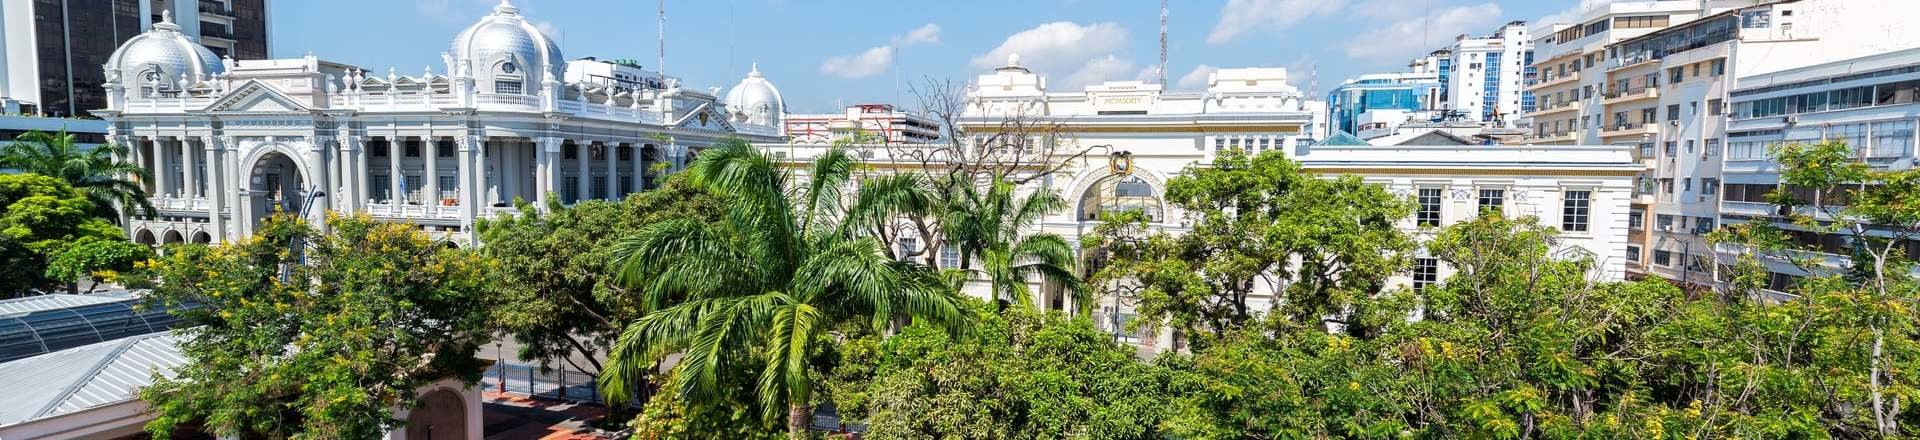 Citas online latinoamerica hoteles zona renunciar